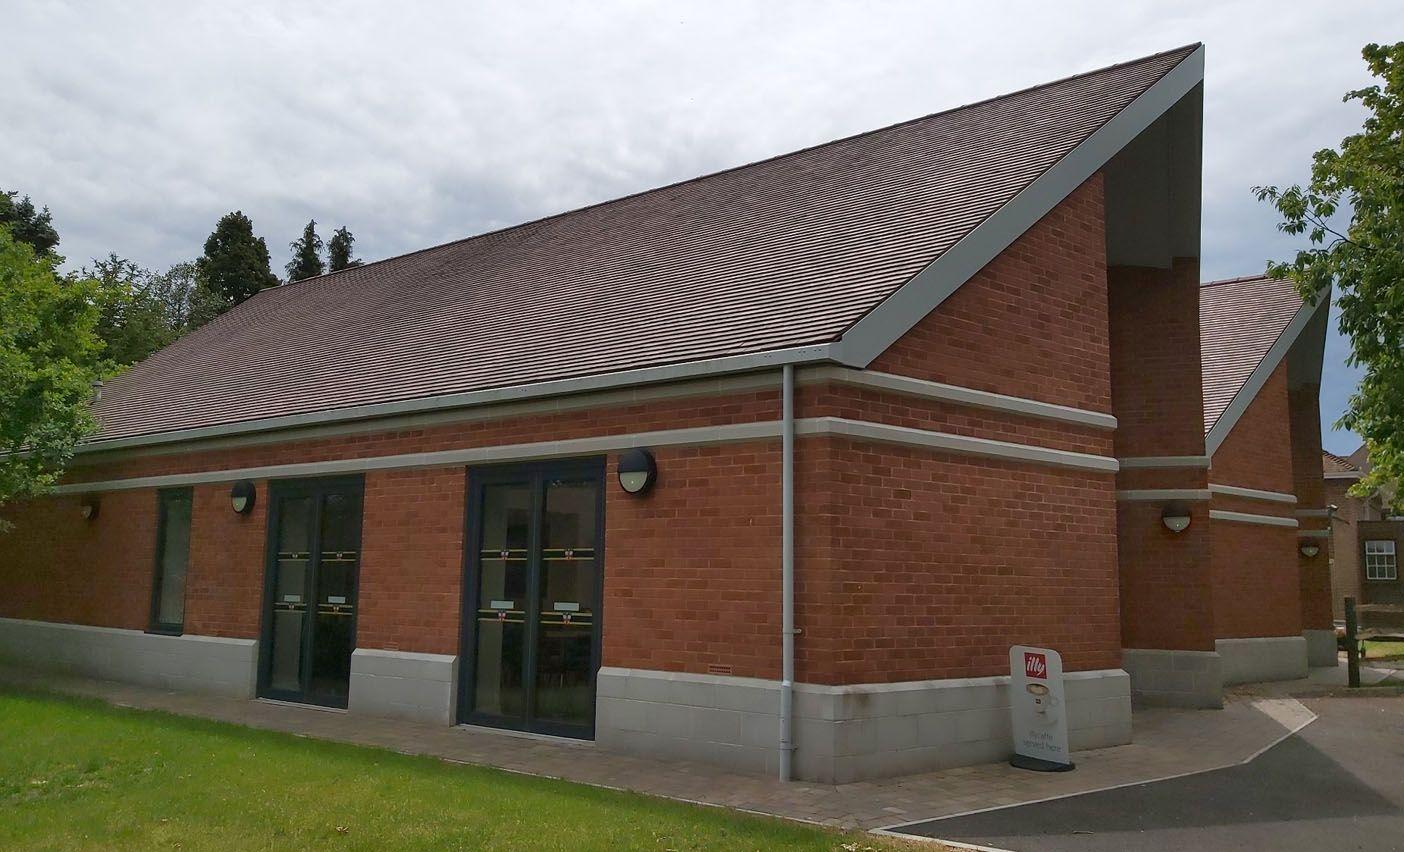 Christ's Hospital School VI Form Centre Horsham, West Sussex 6